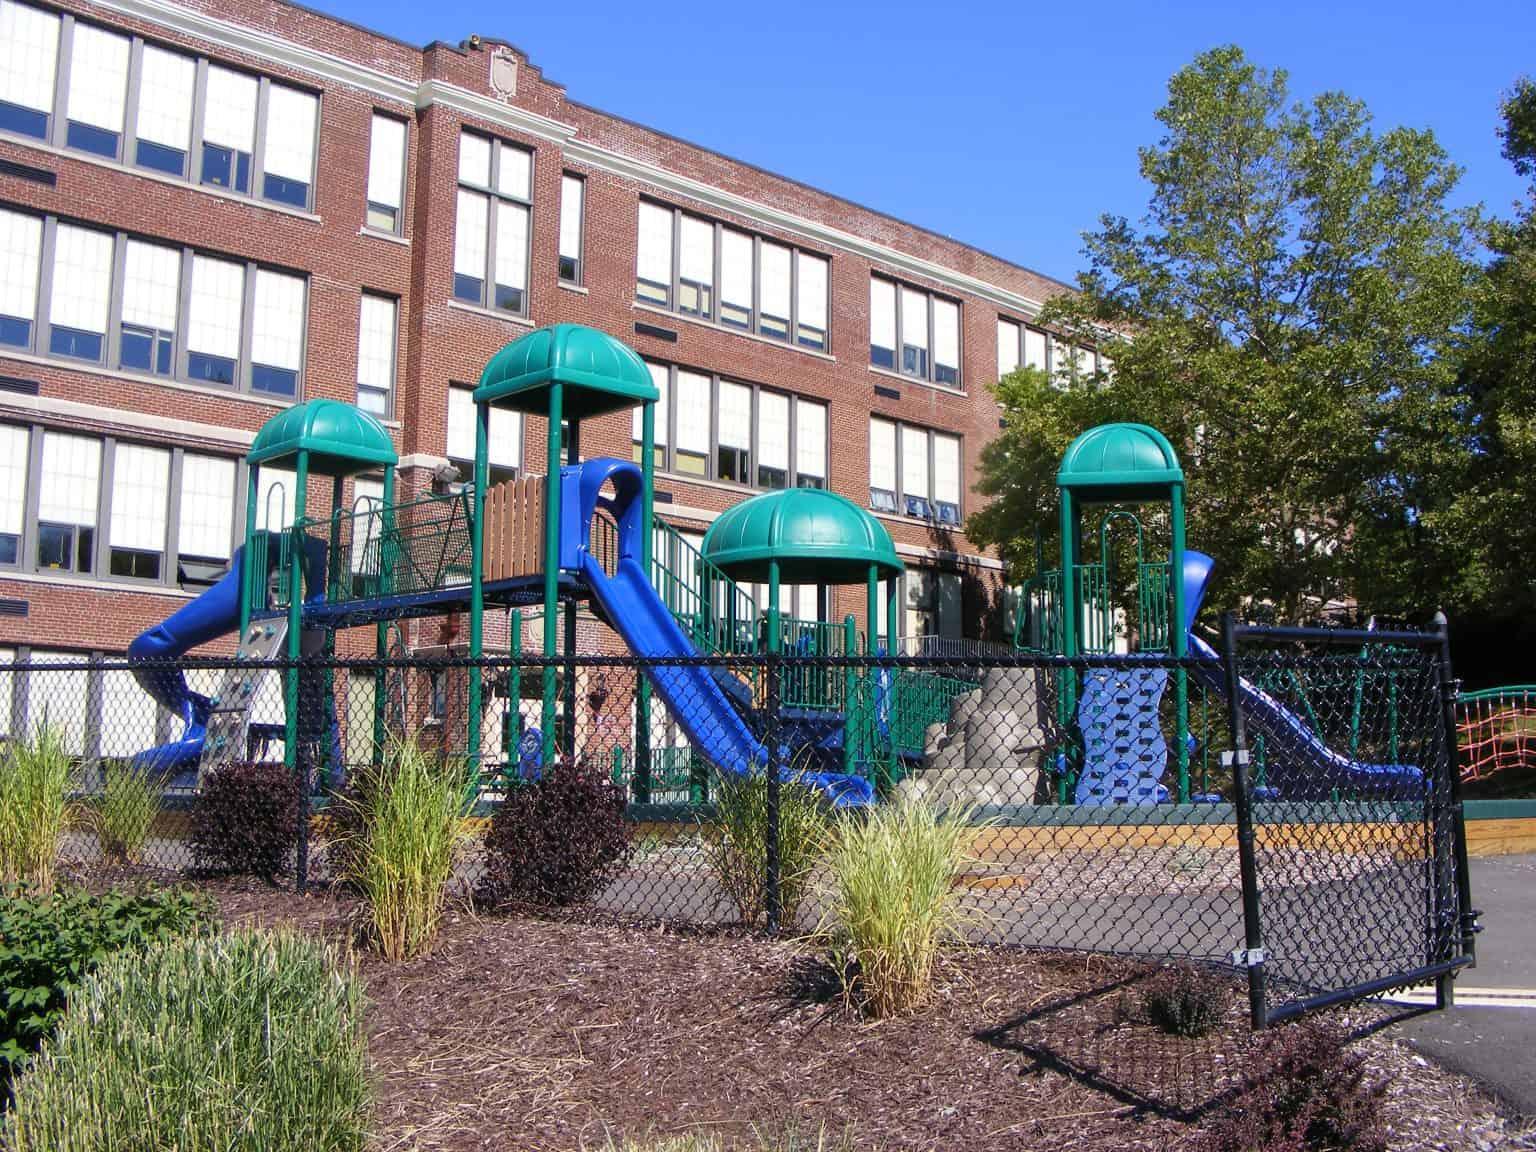 woodrow-wilson-elementary-playground-binghamton-ny_11711834285_o-1536x1152